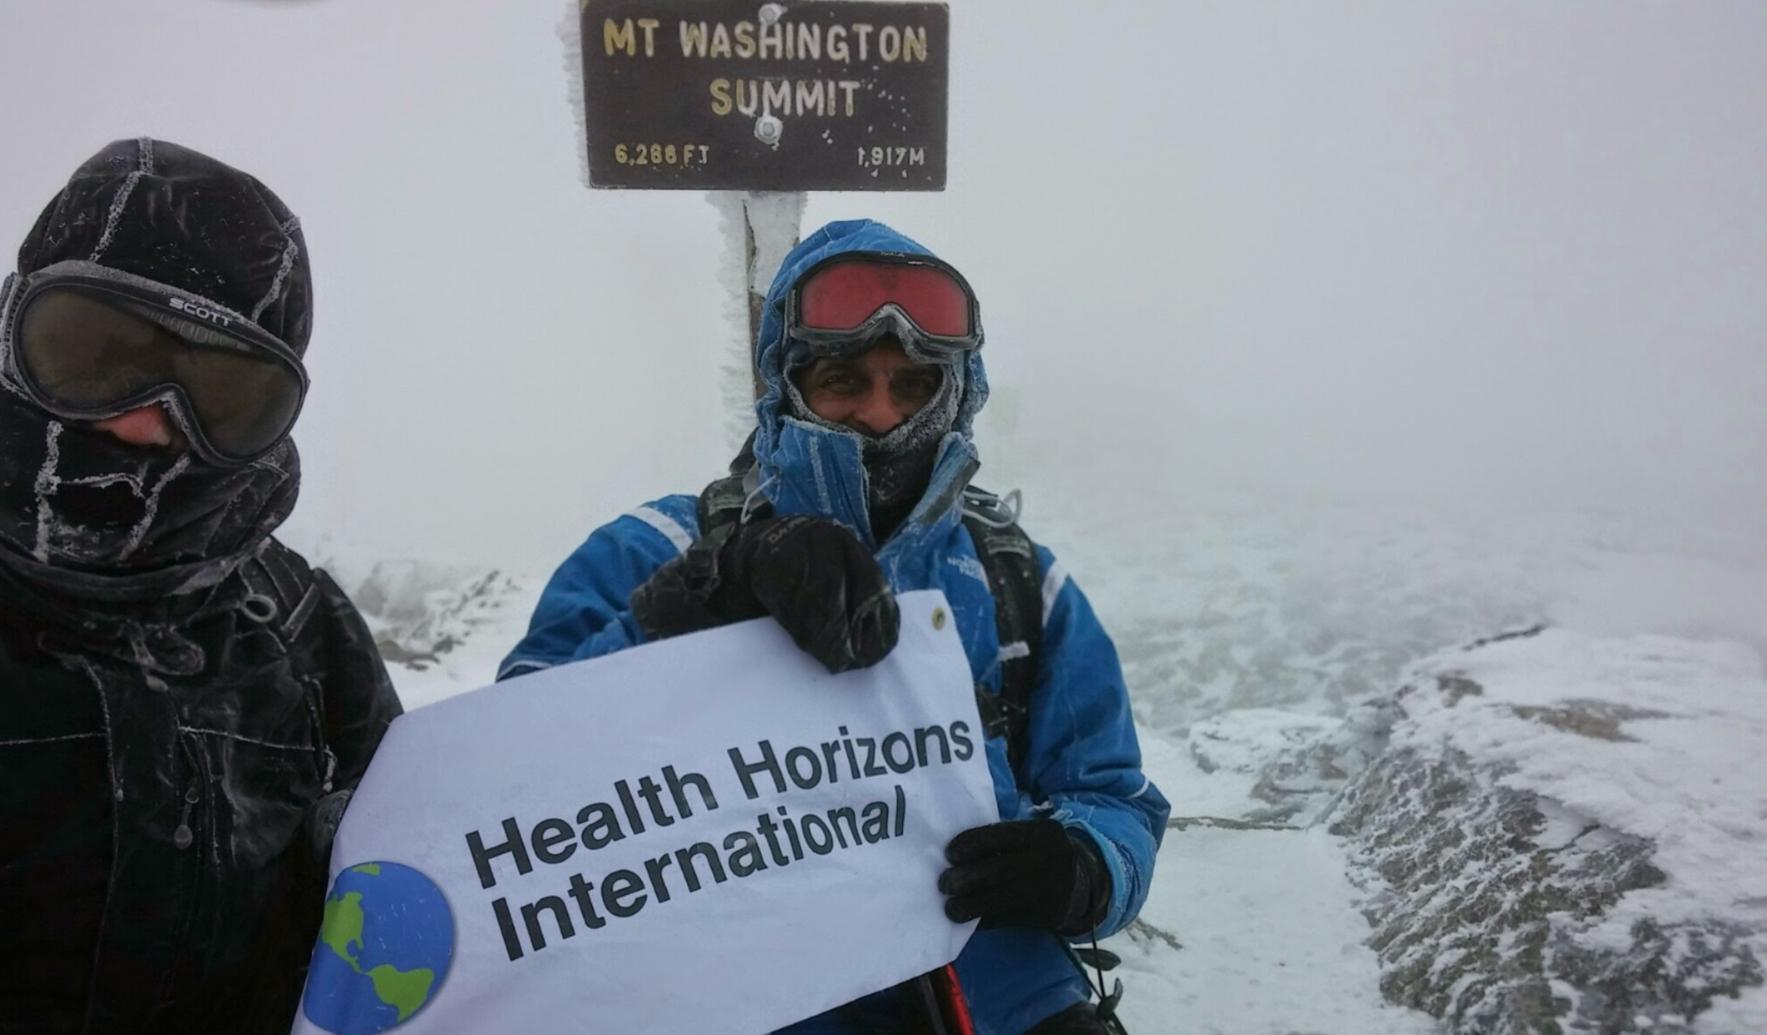 Donate now to support Ayaz's Mt. Washington Climb image